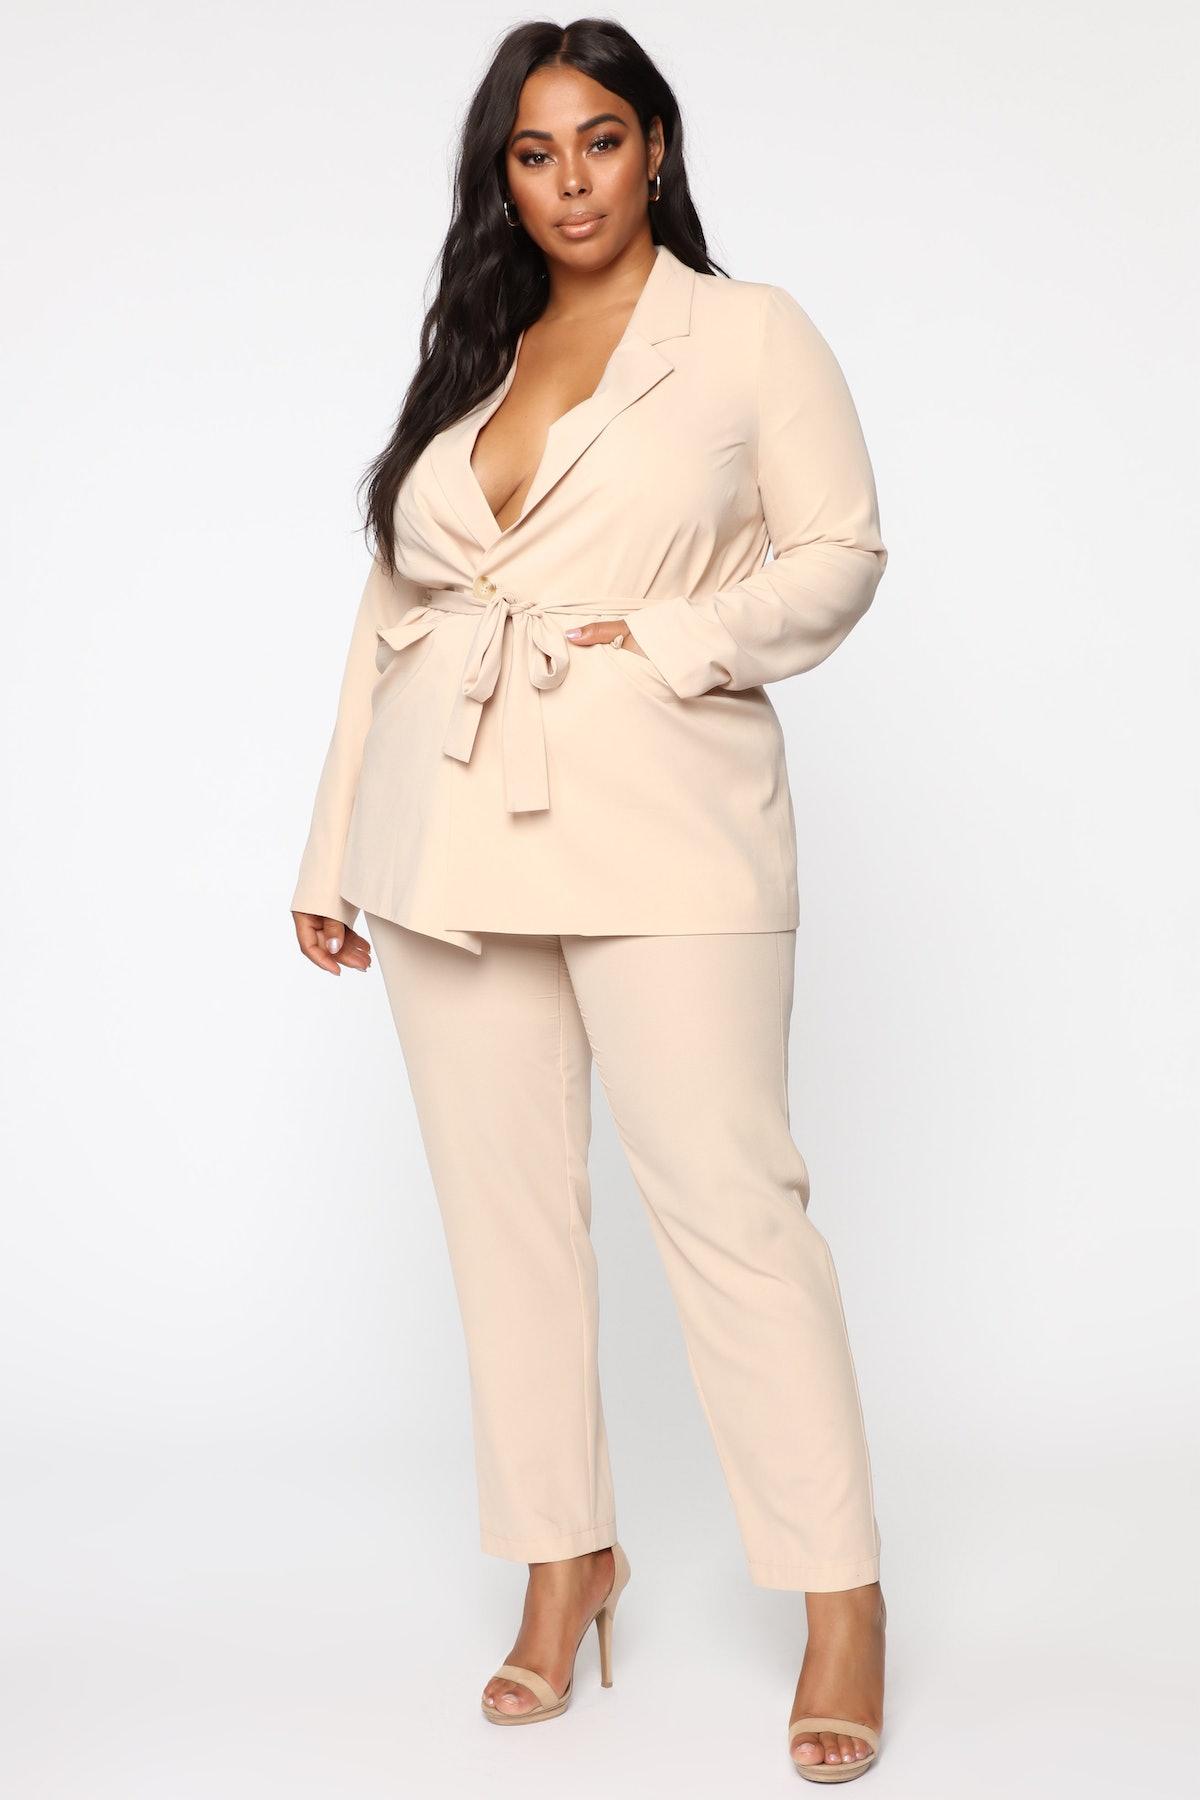 Look Ya Best Suit Set - Taupe